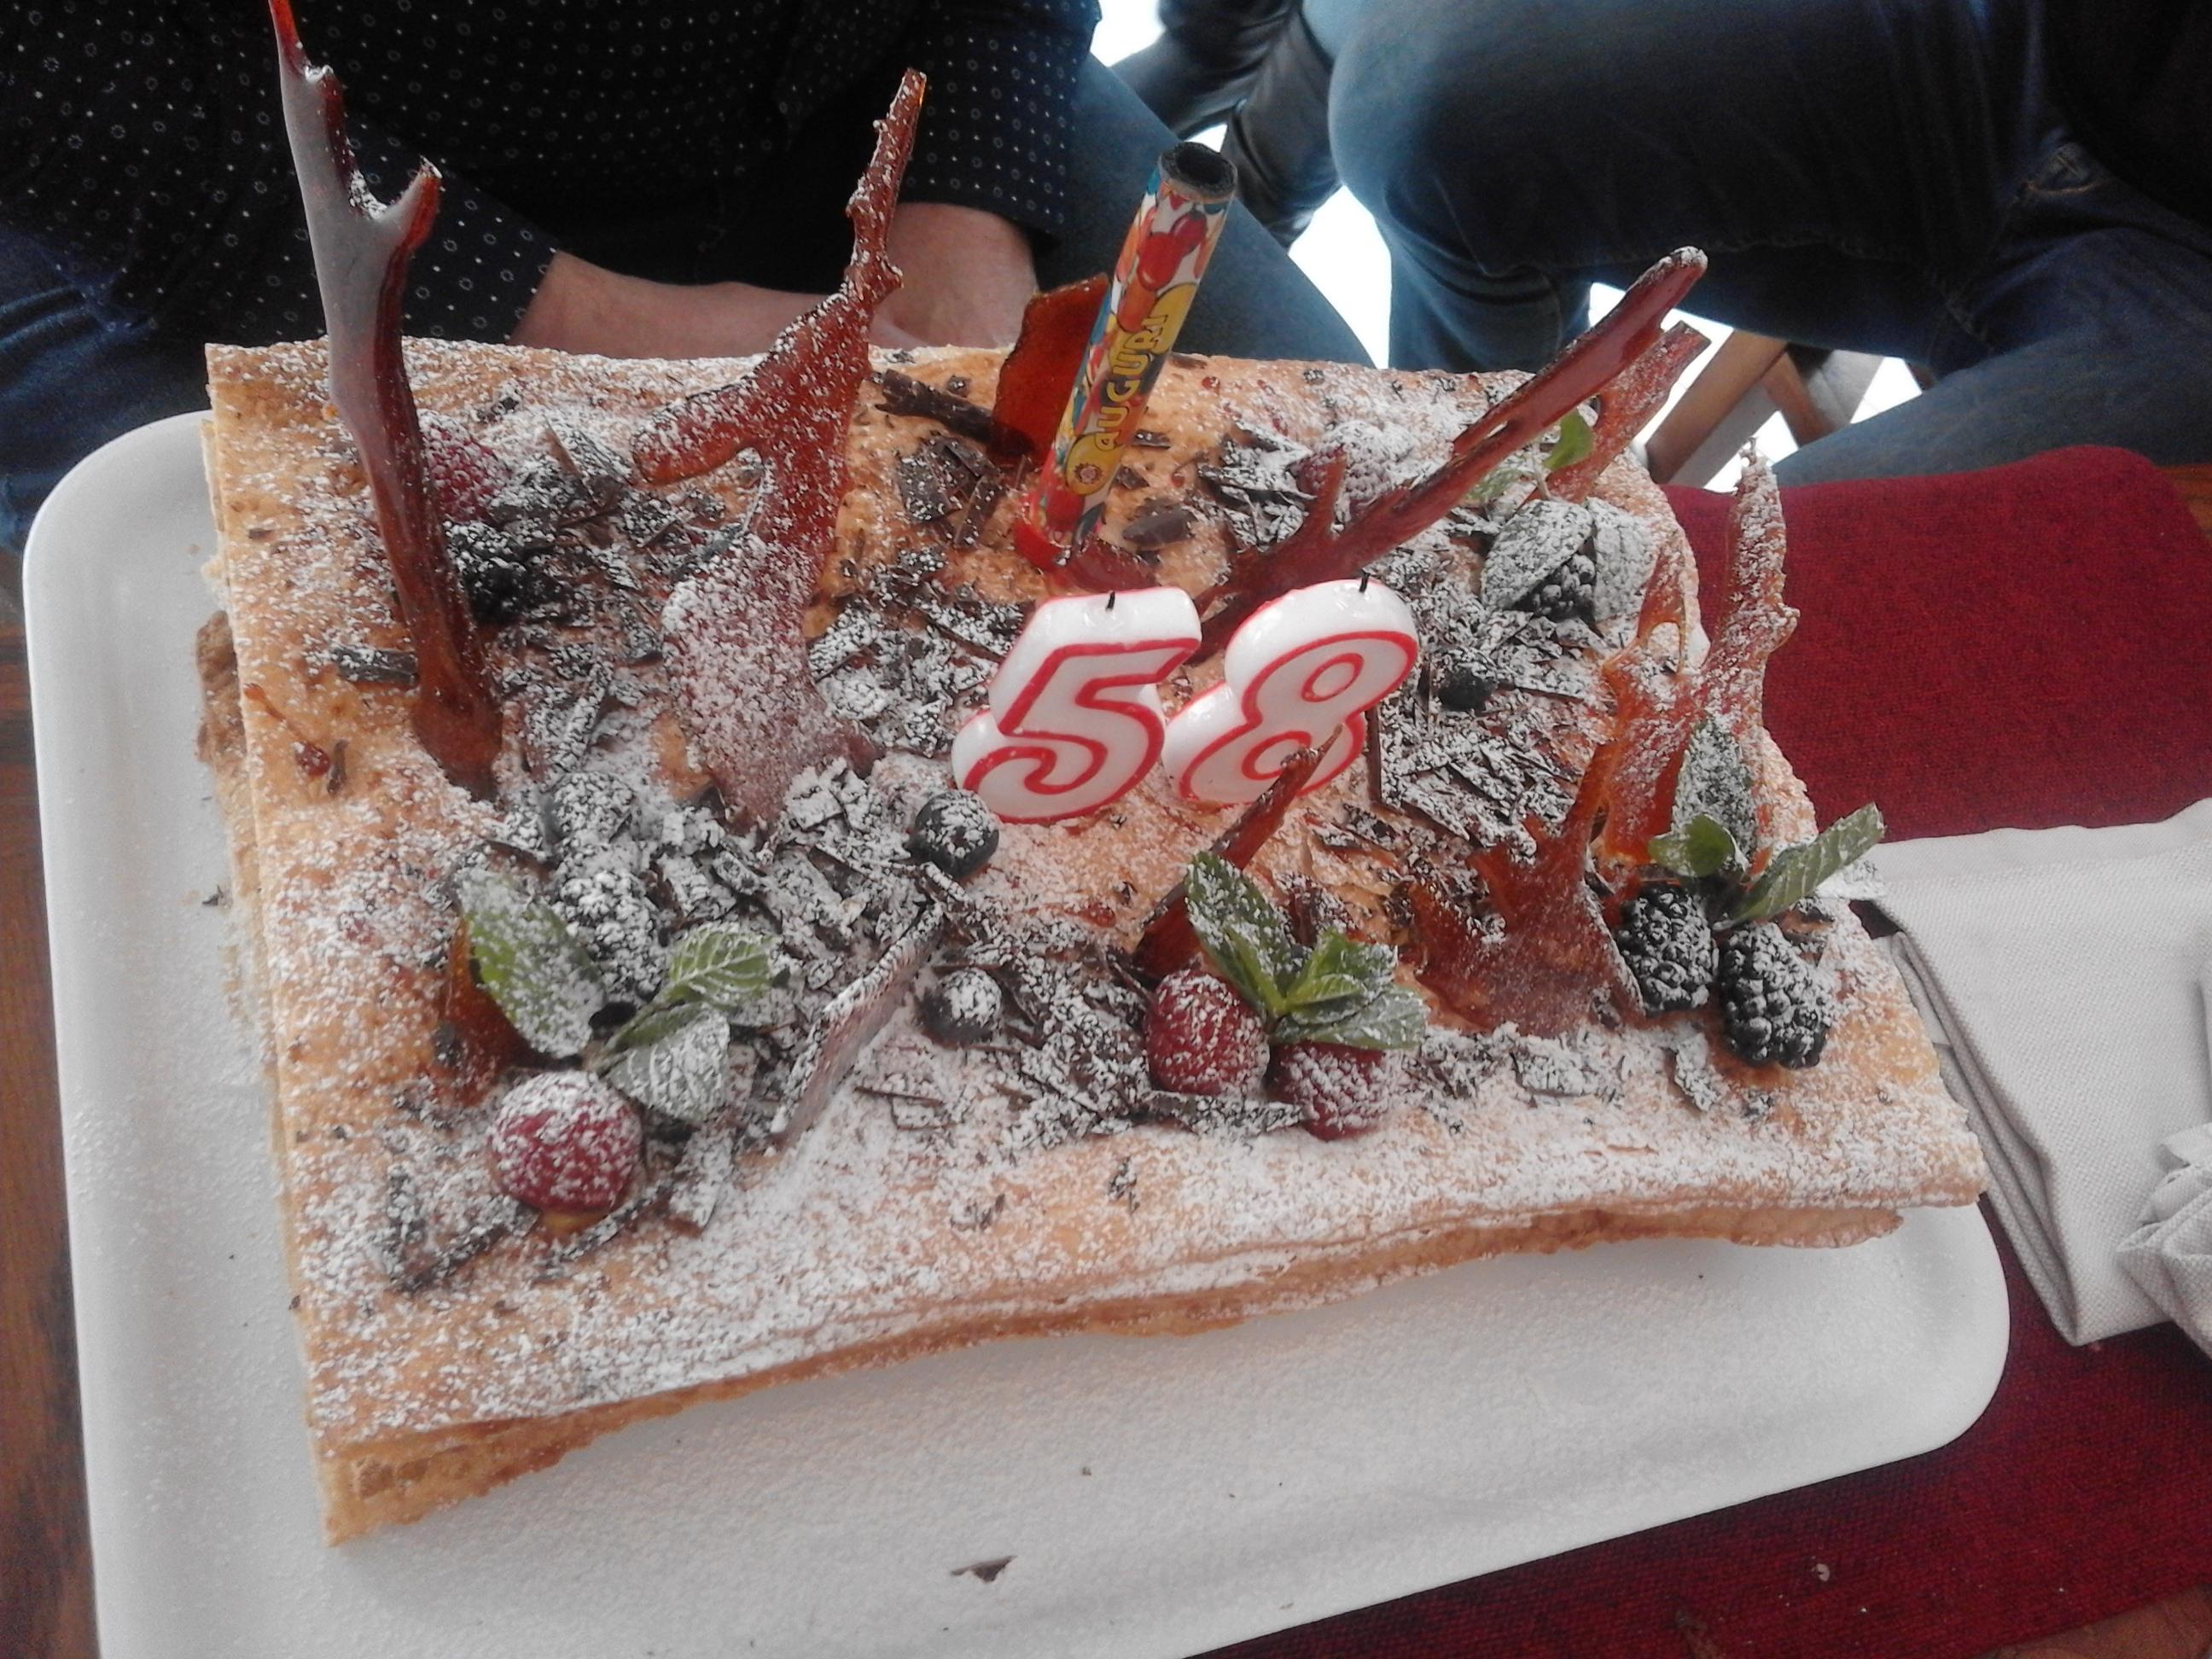 Terrific File Birthday Cakes Of Italy 2018 05 Wikimedia Commons Personalised Birthday Cards Beptaeletsinfo